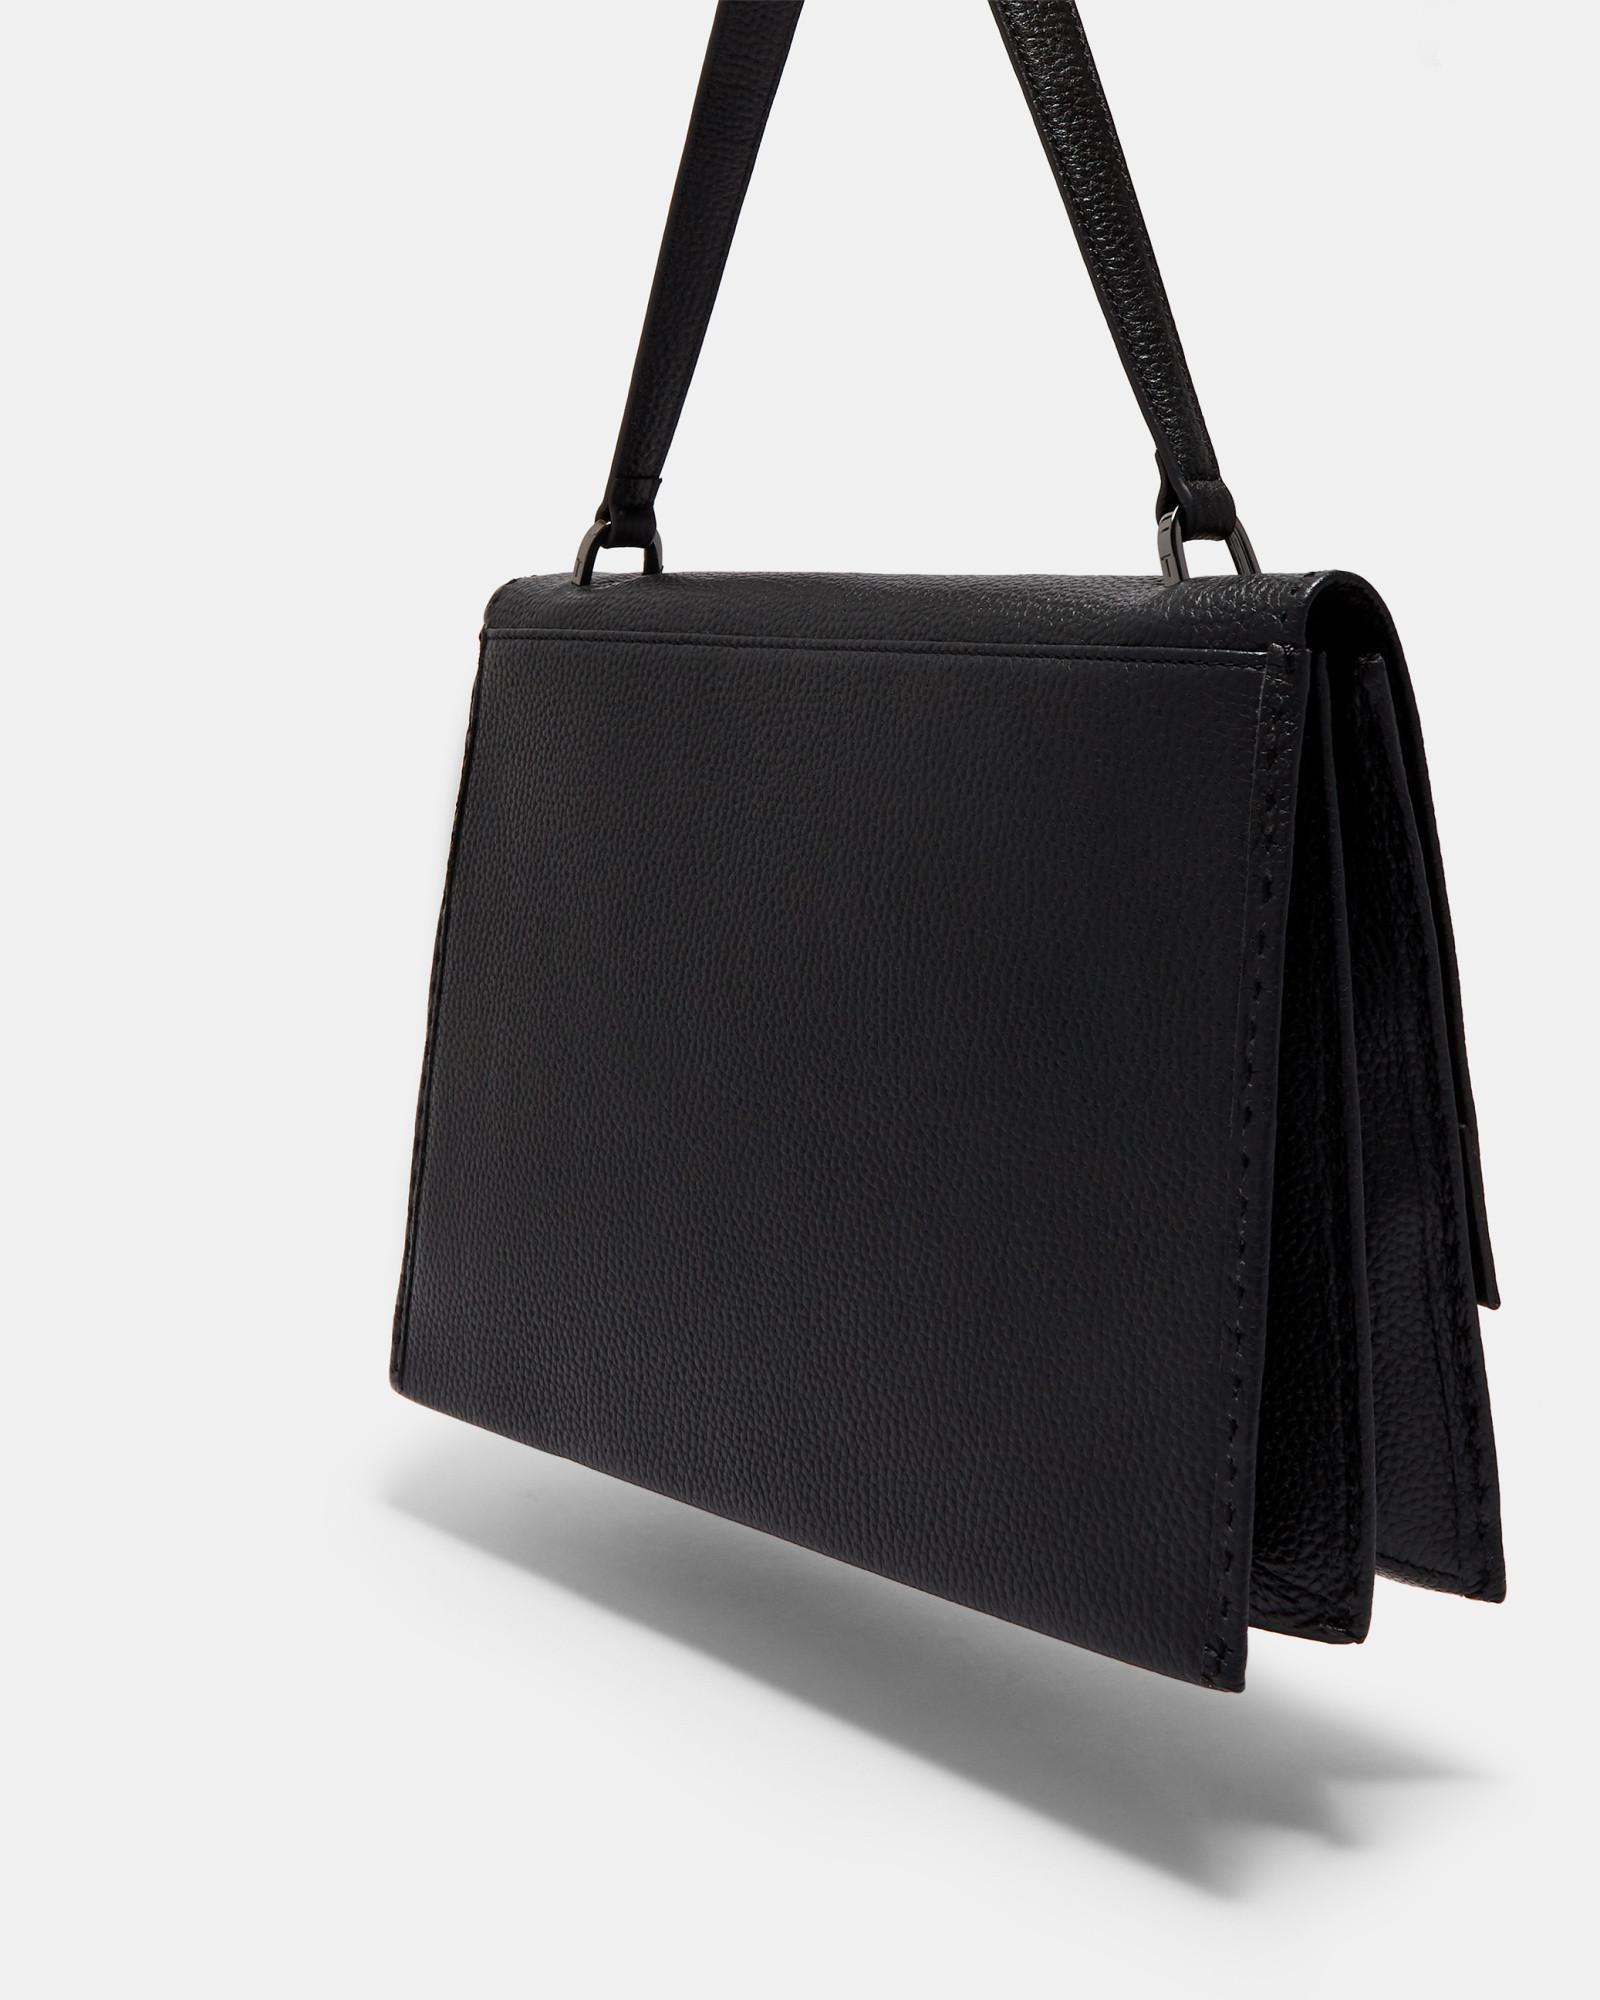 65a9a317d0a9 Lyst - Ted Baker Jessi Leather Shoulder Bag - in Black